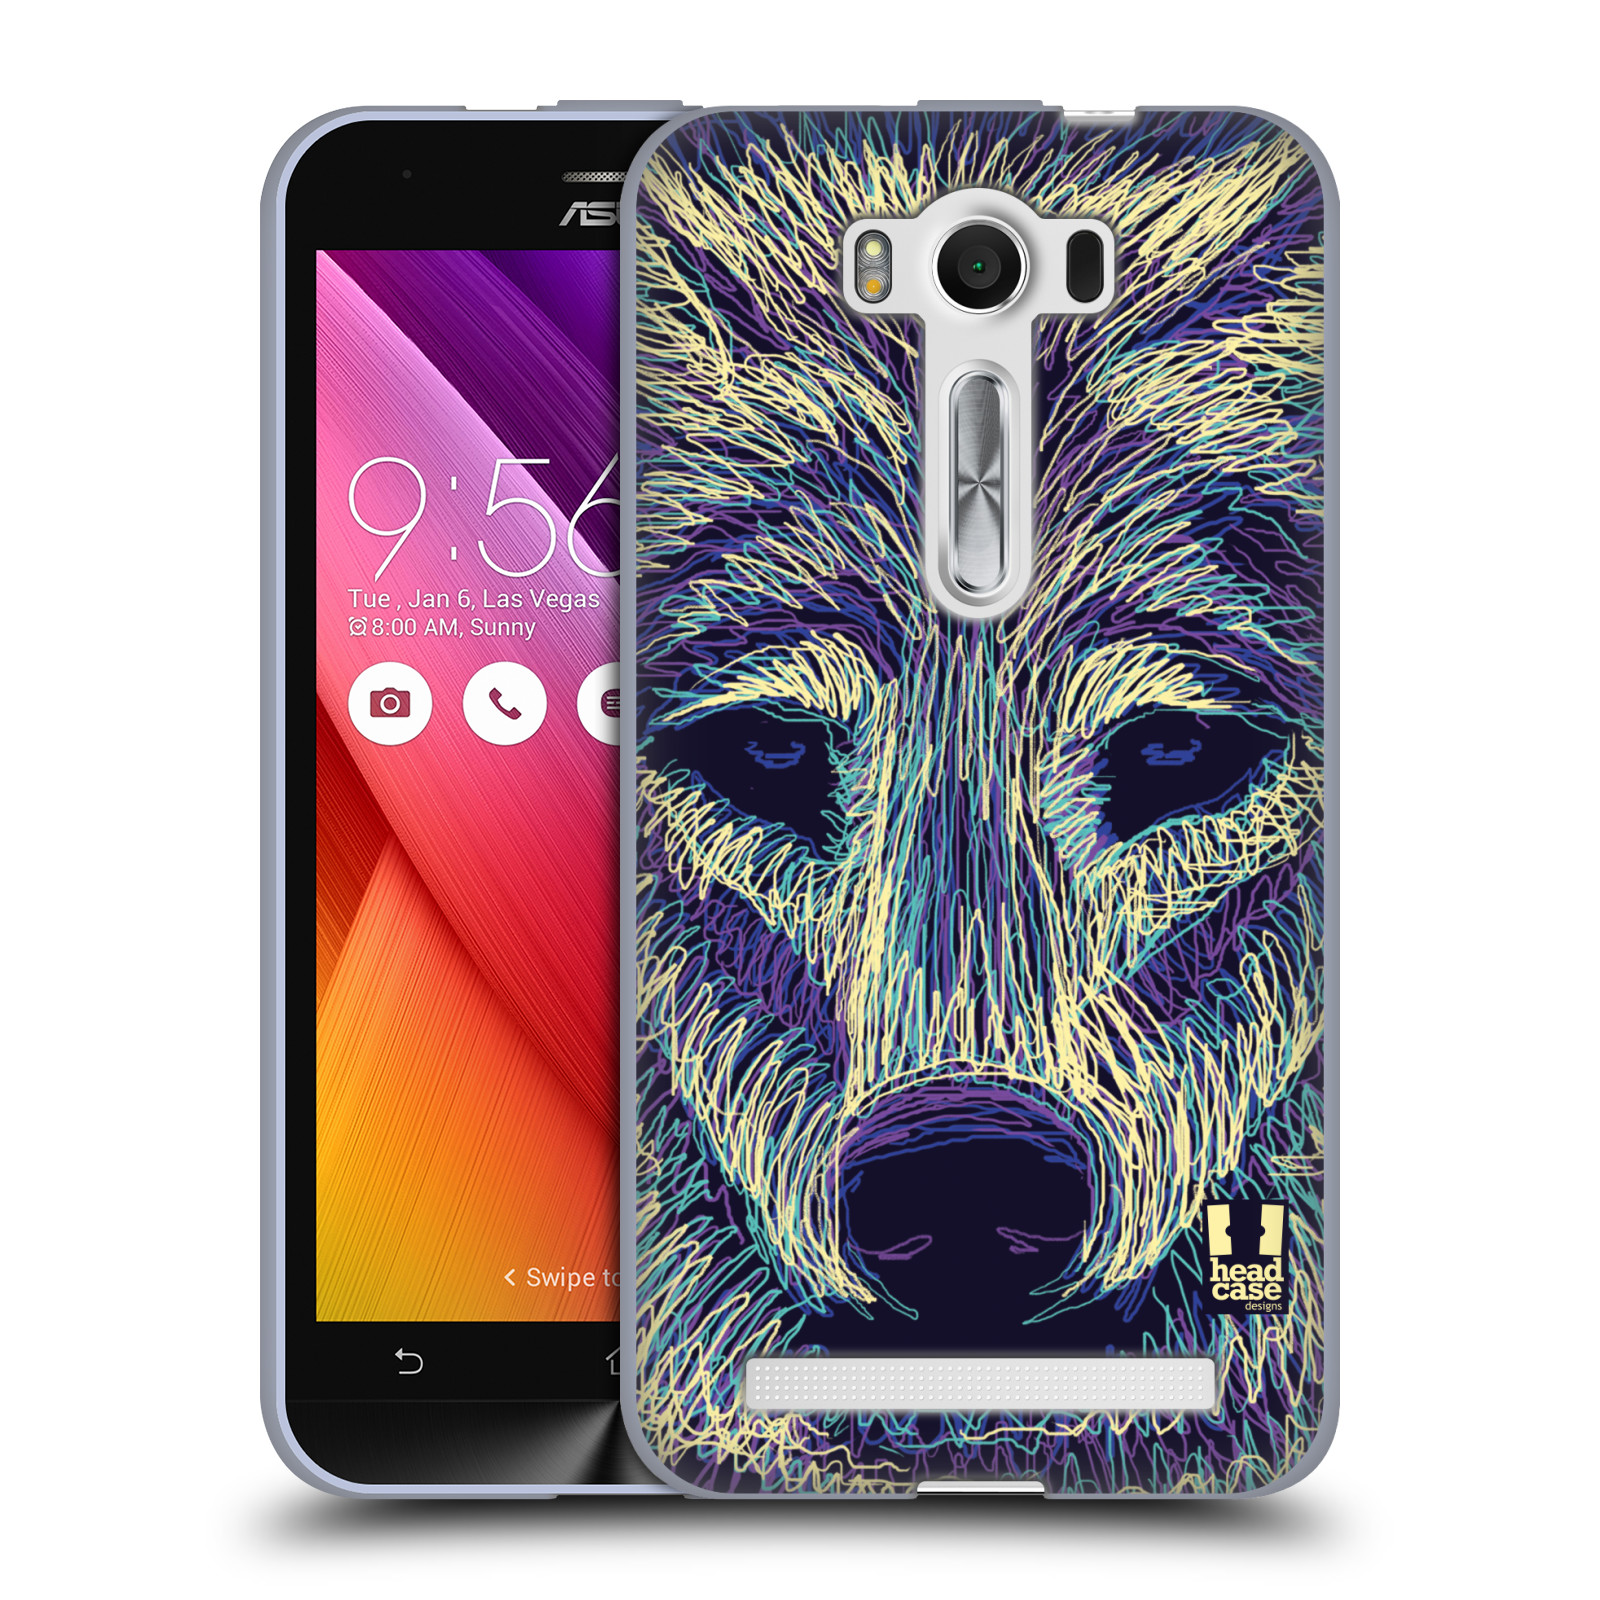 "HEAD CASE silikonový obal na mobil Asus Zenfone 2 LASER (ZE500KL s 5"" displejem) vzor zvíře čmáranice vlk"